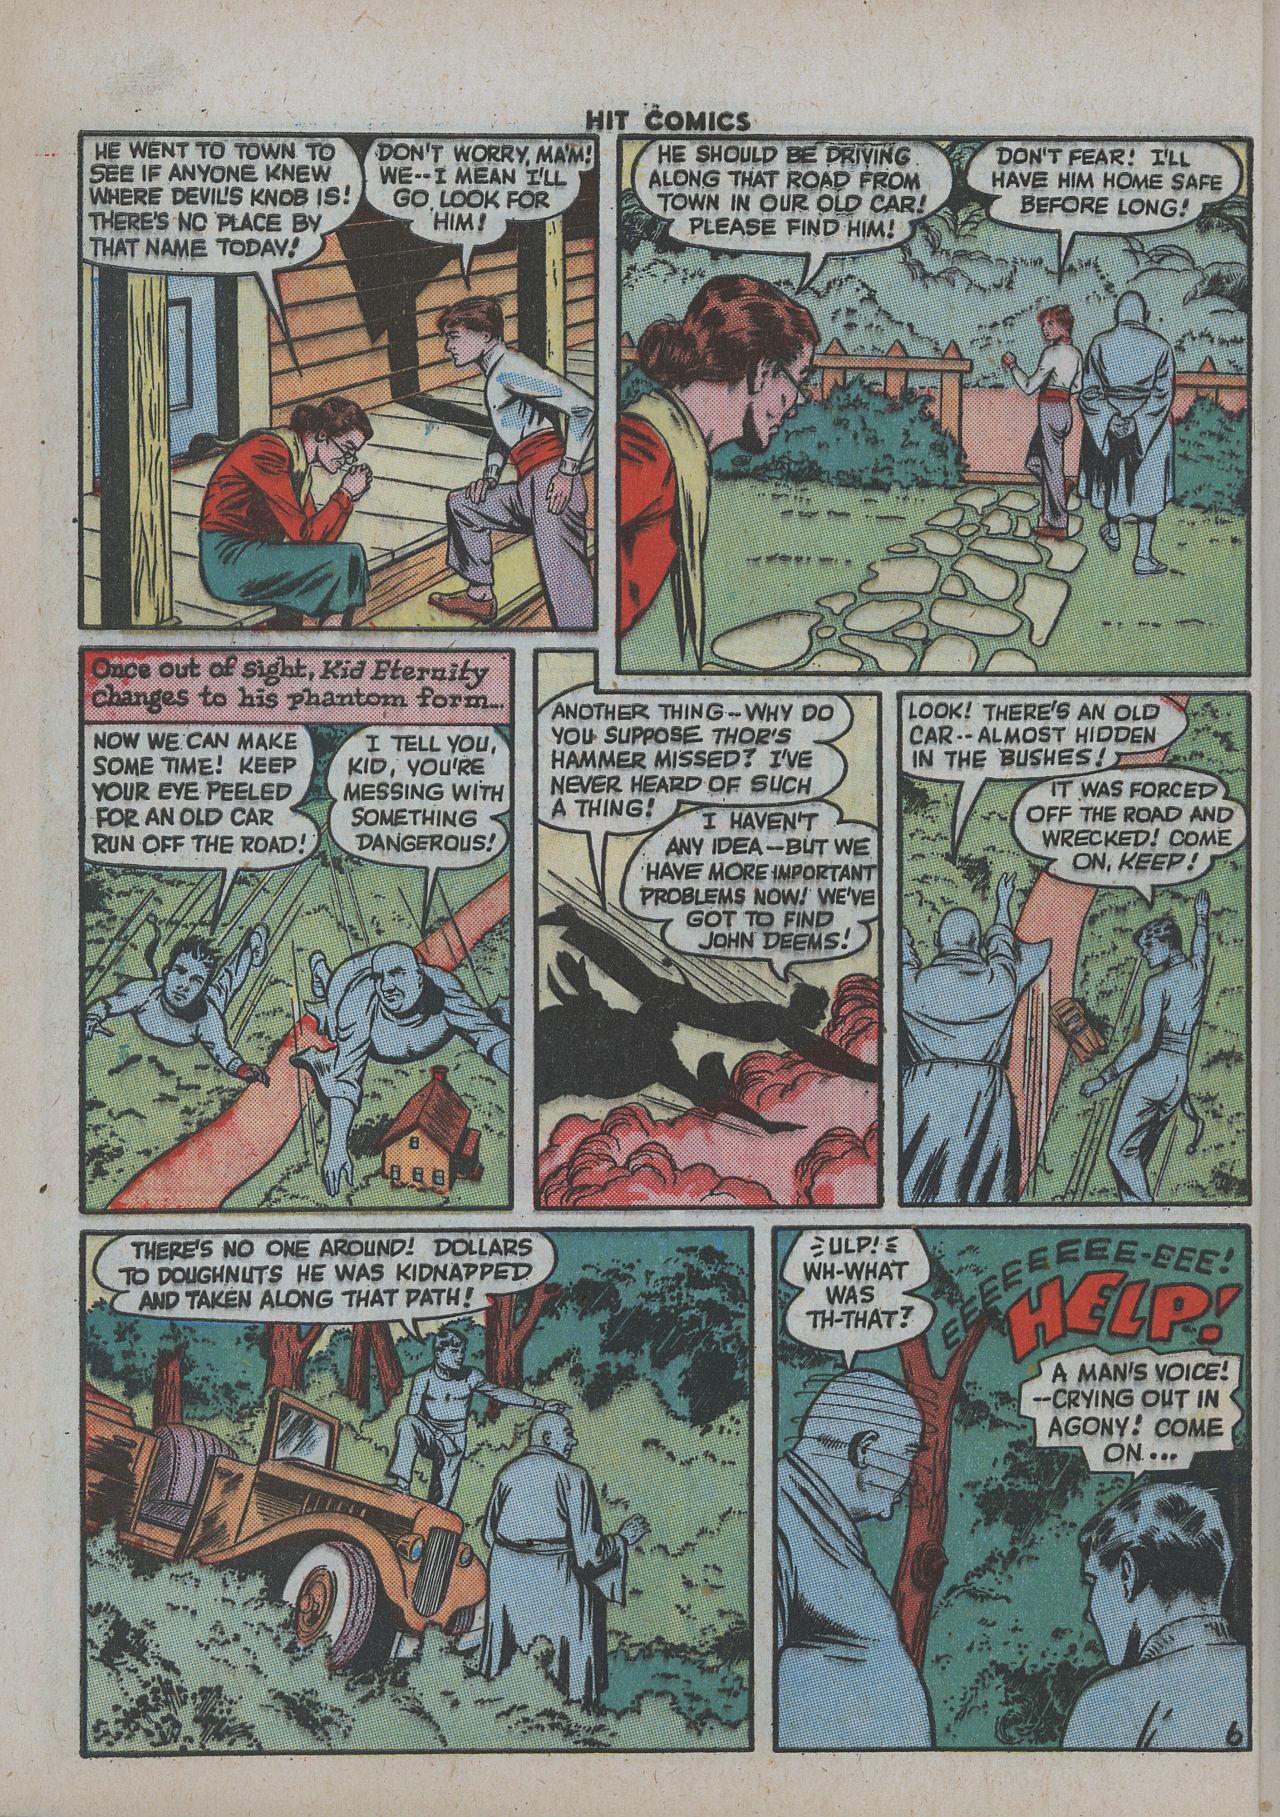 Read online Hit Comics comic -  Issue #38 - 11